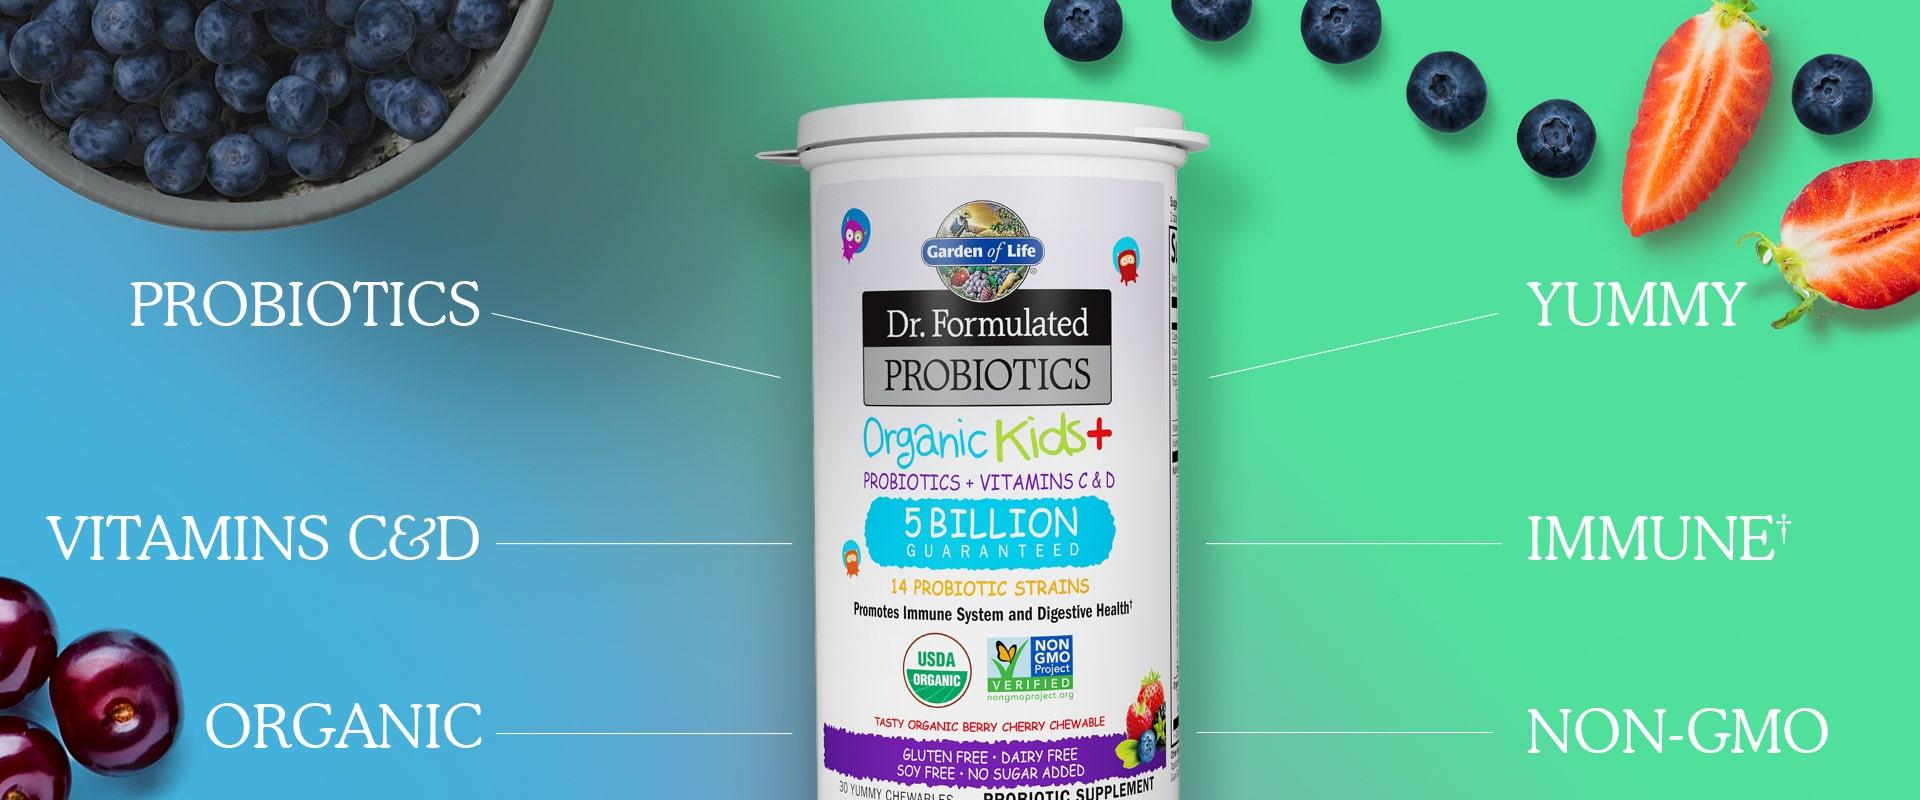 dr formulated kids+ probiotics by garden of life